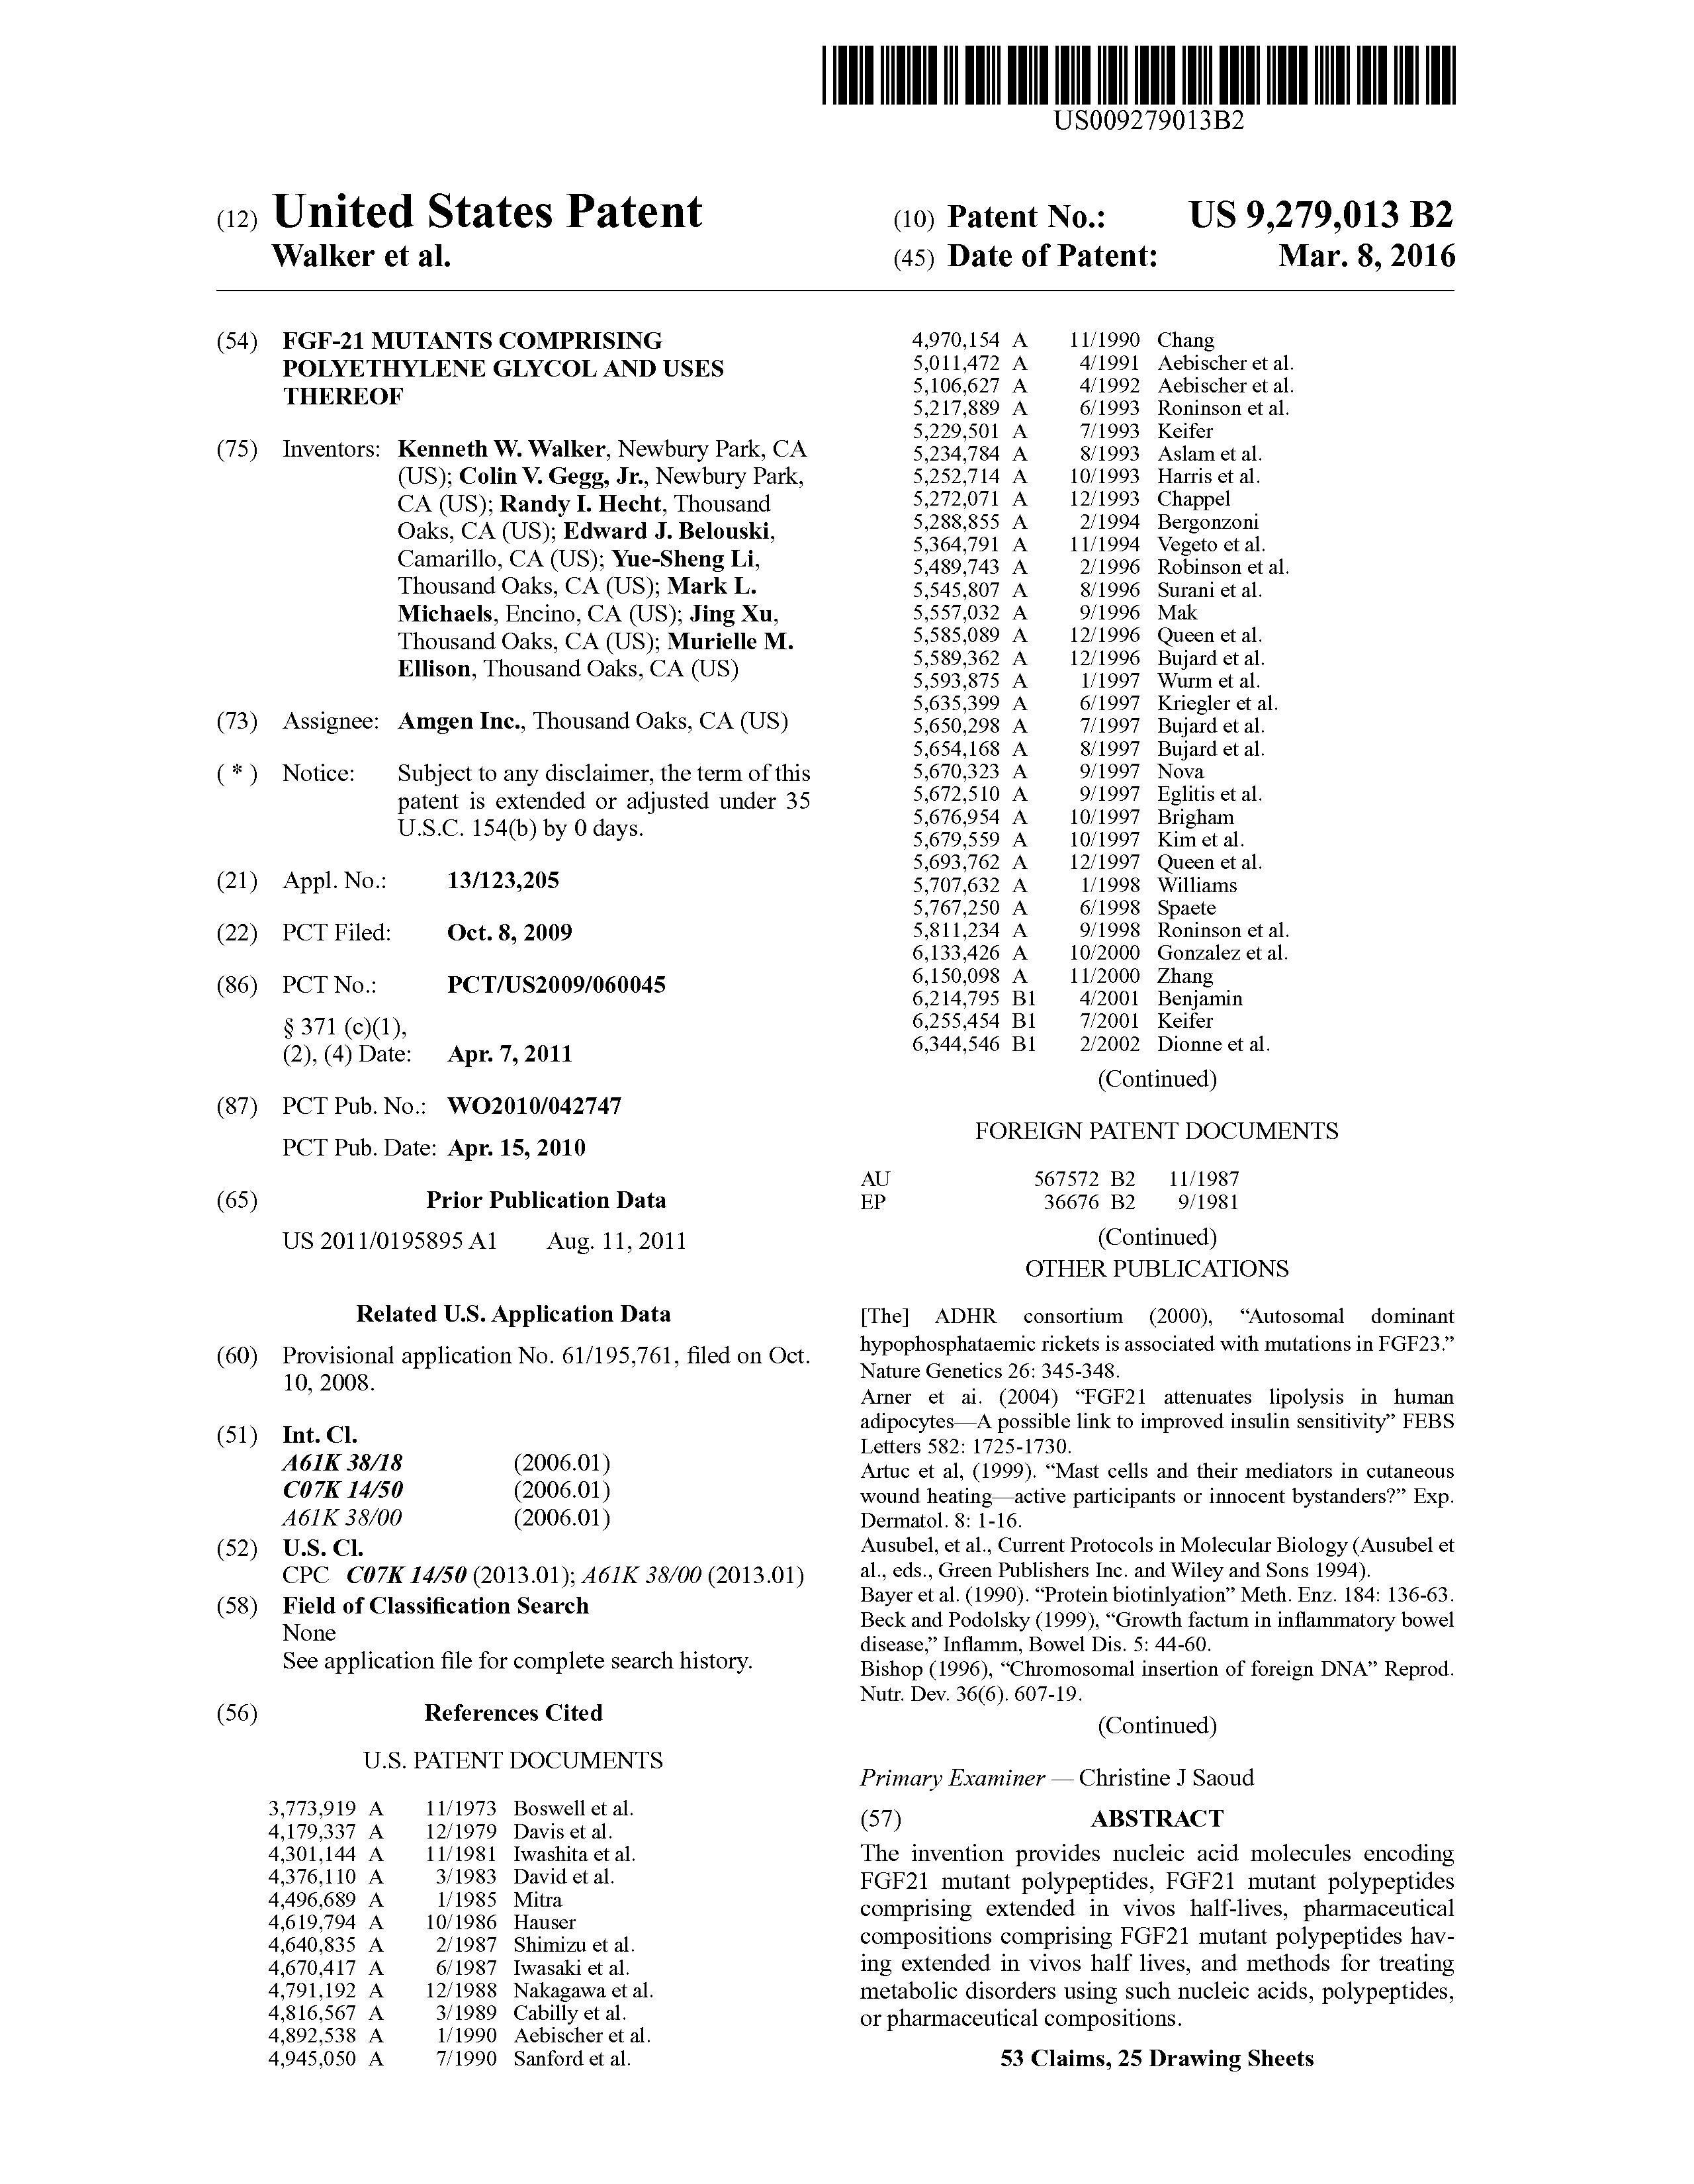 US 9279013 B2 - Fgf-21 Mutants Comprising Polyethylene